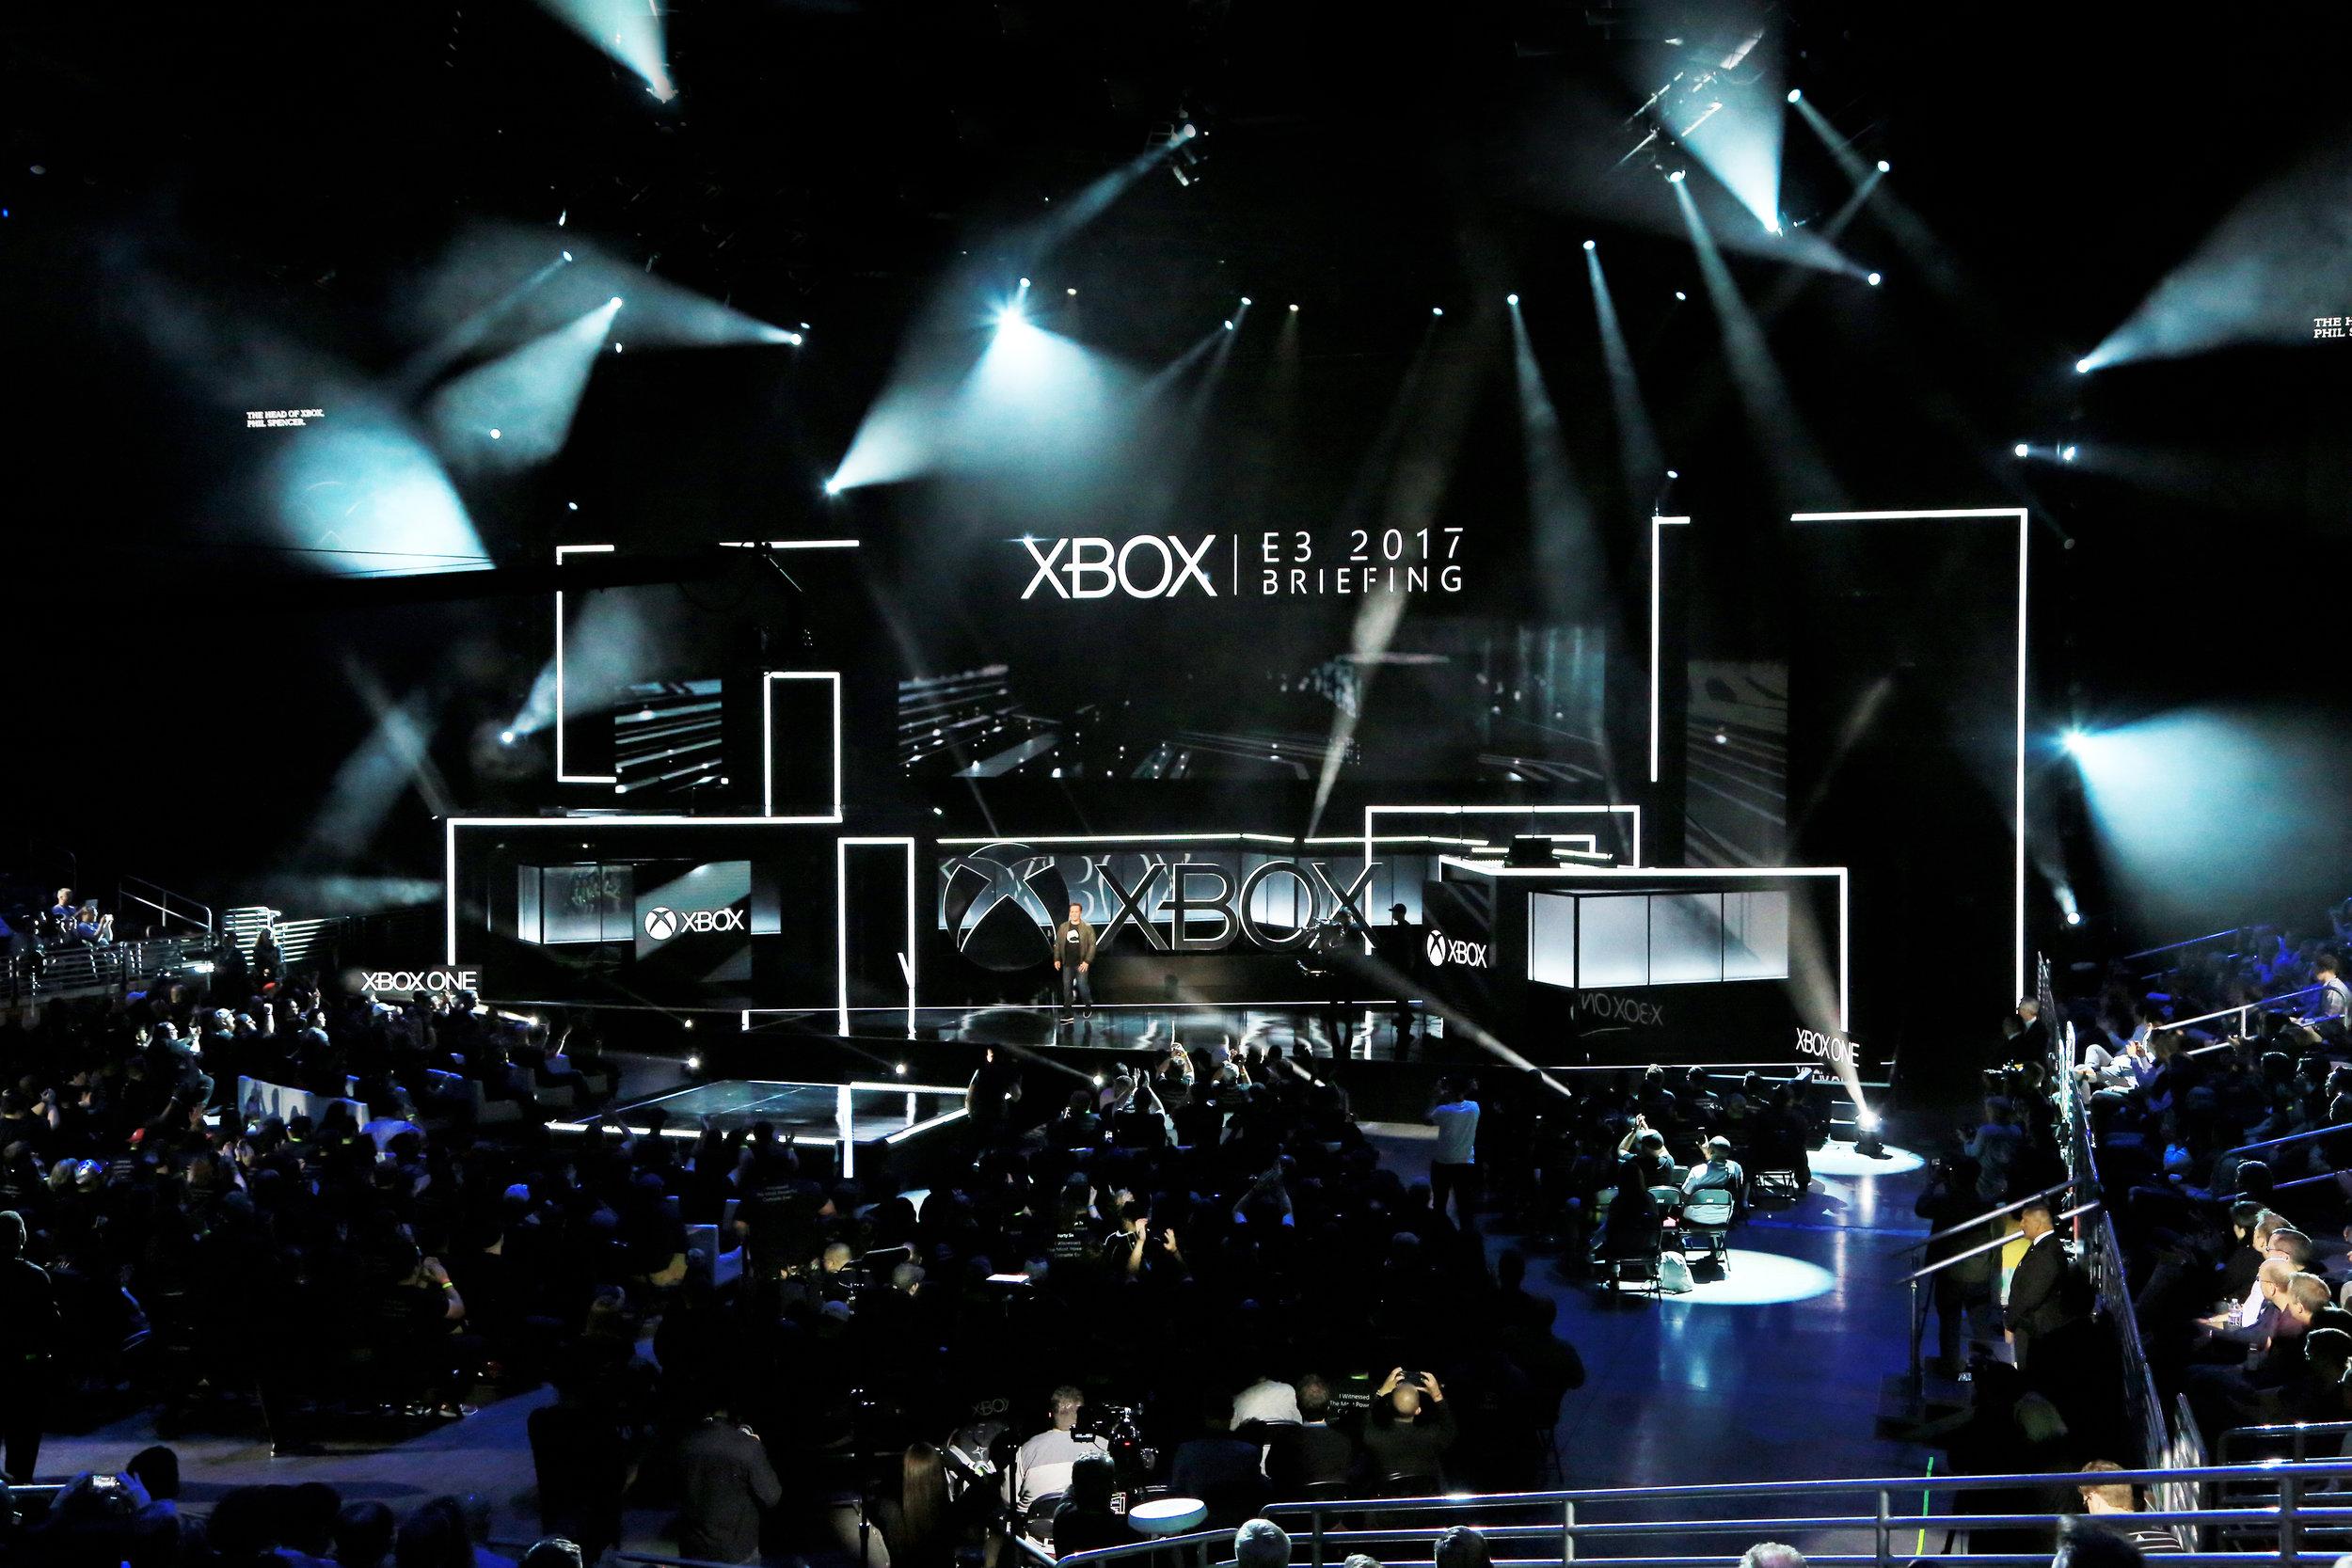 Xbox E3 Media Briefing 2017